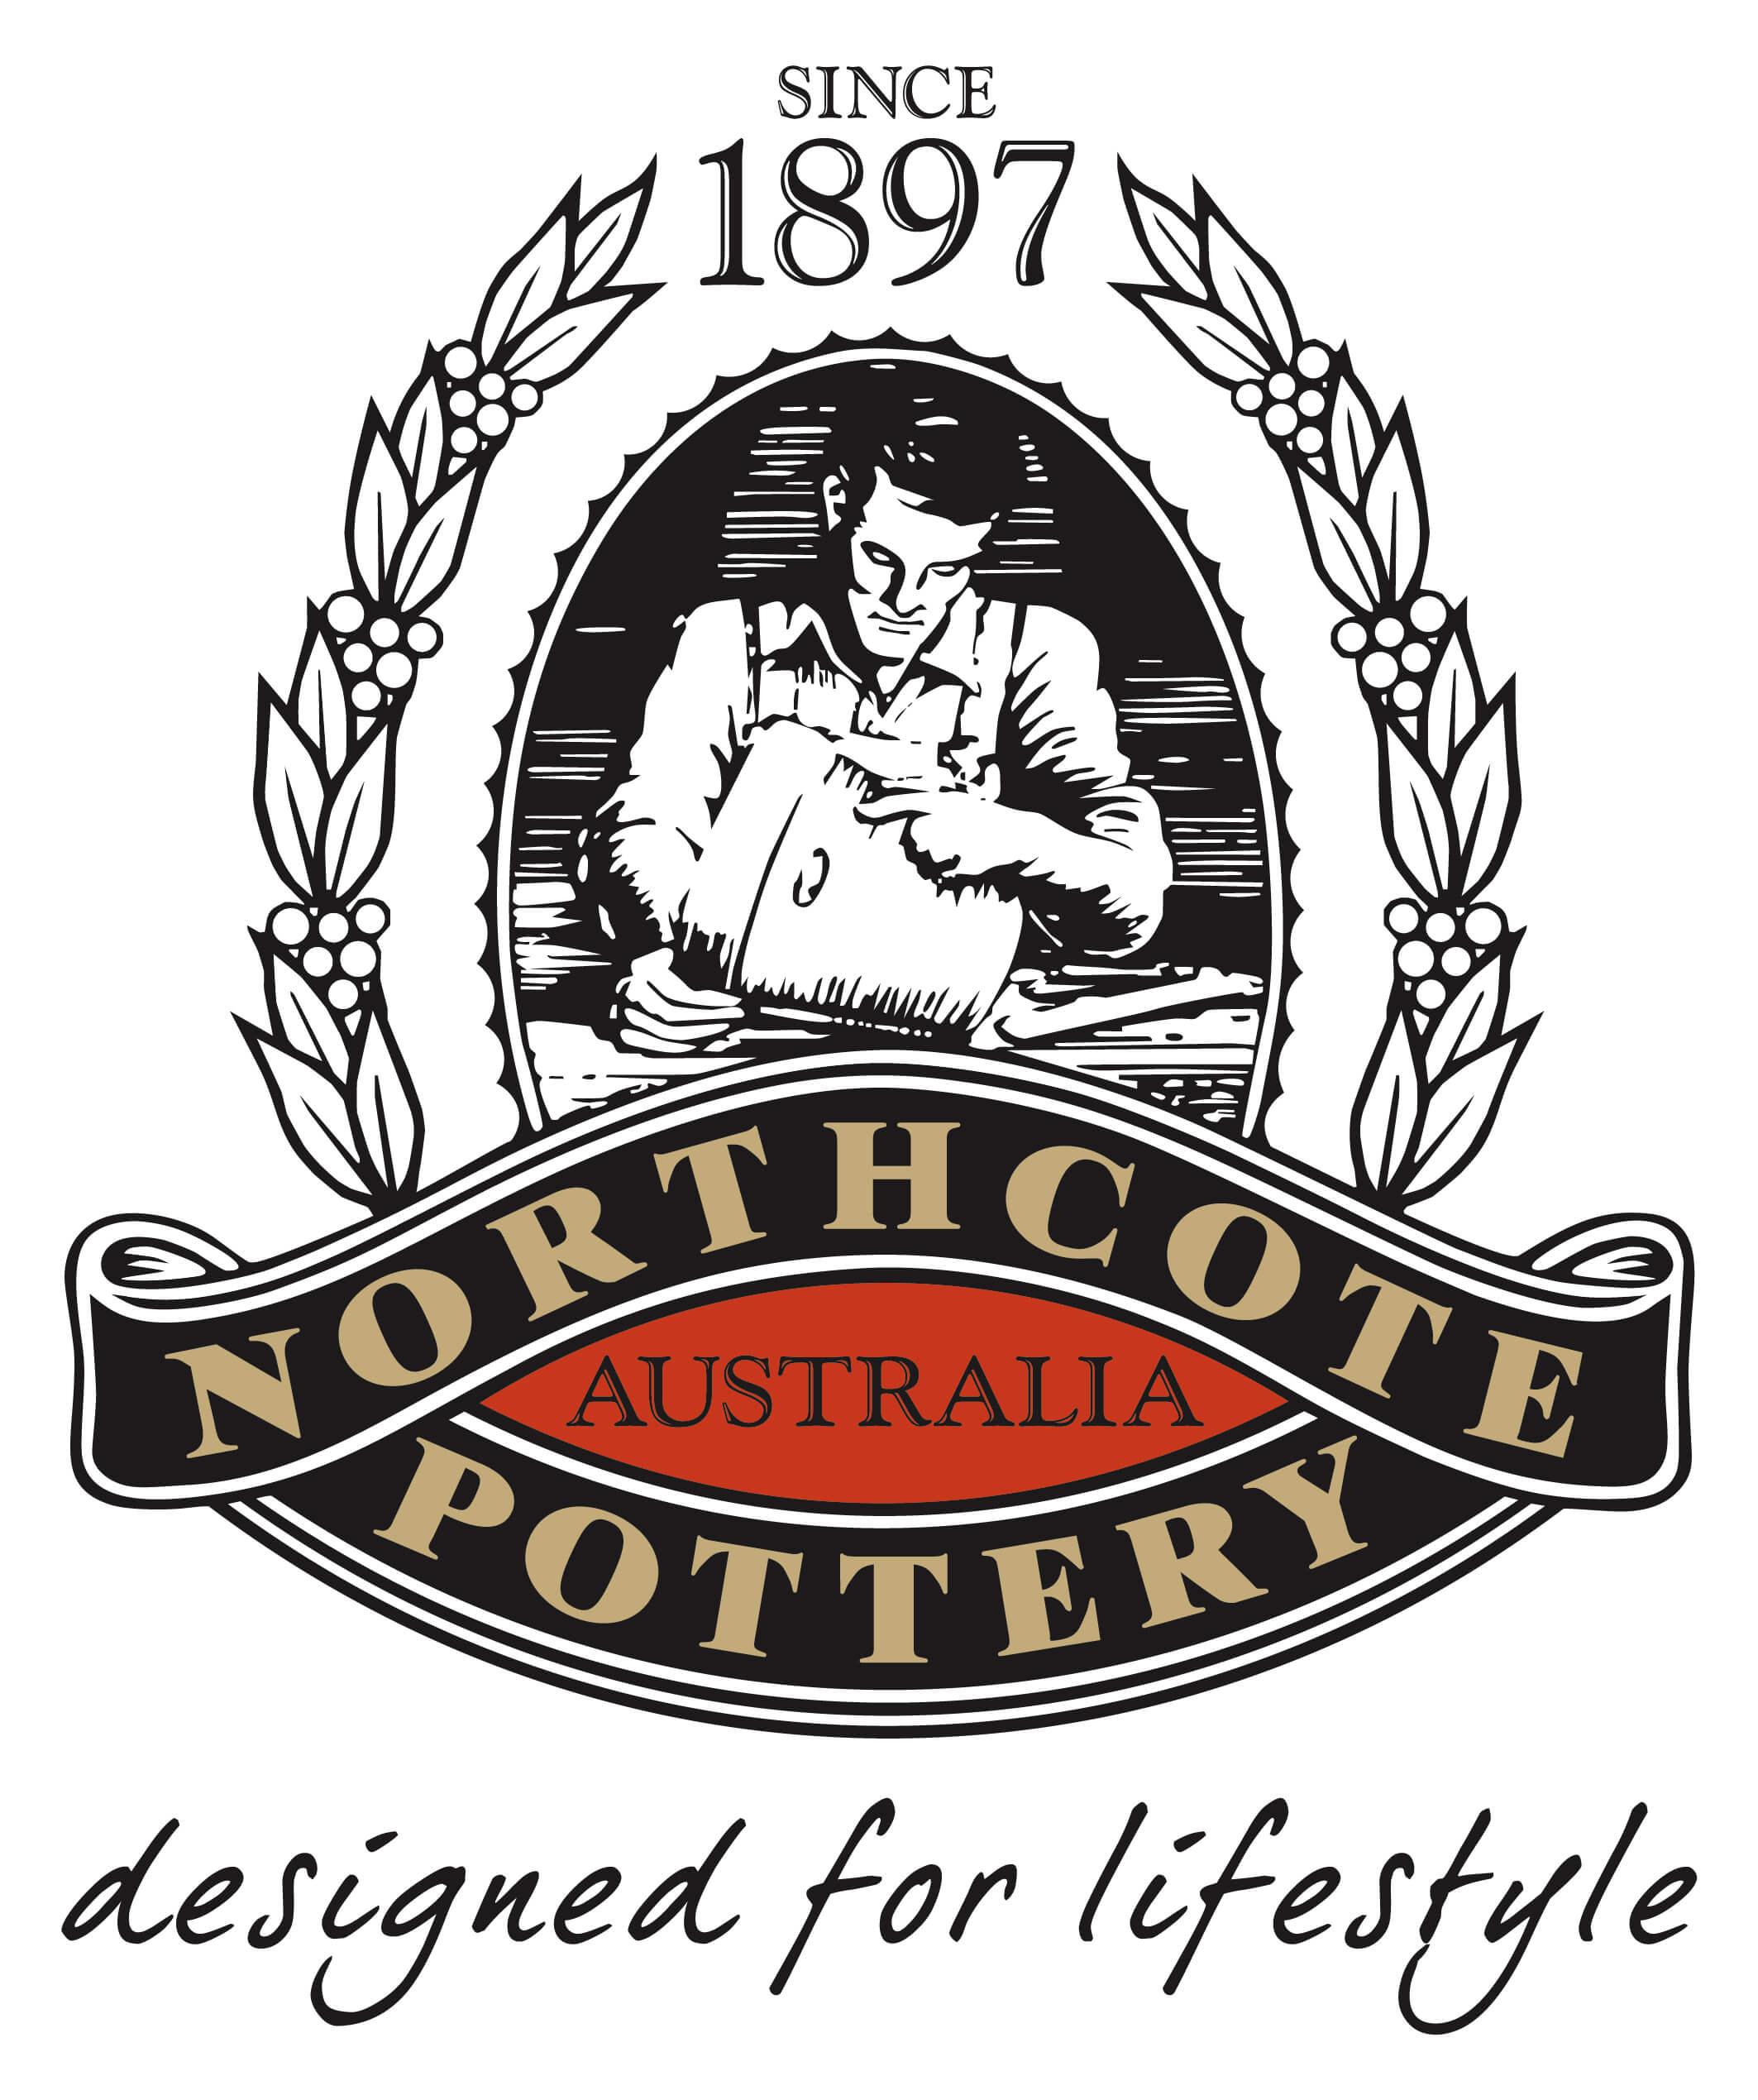 NP_Logo+Slogan_1897